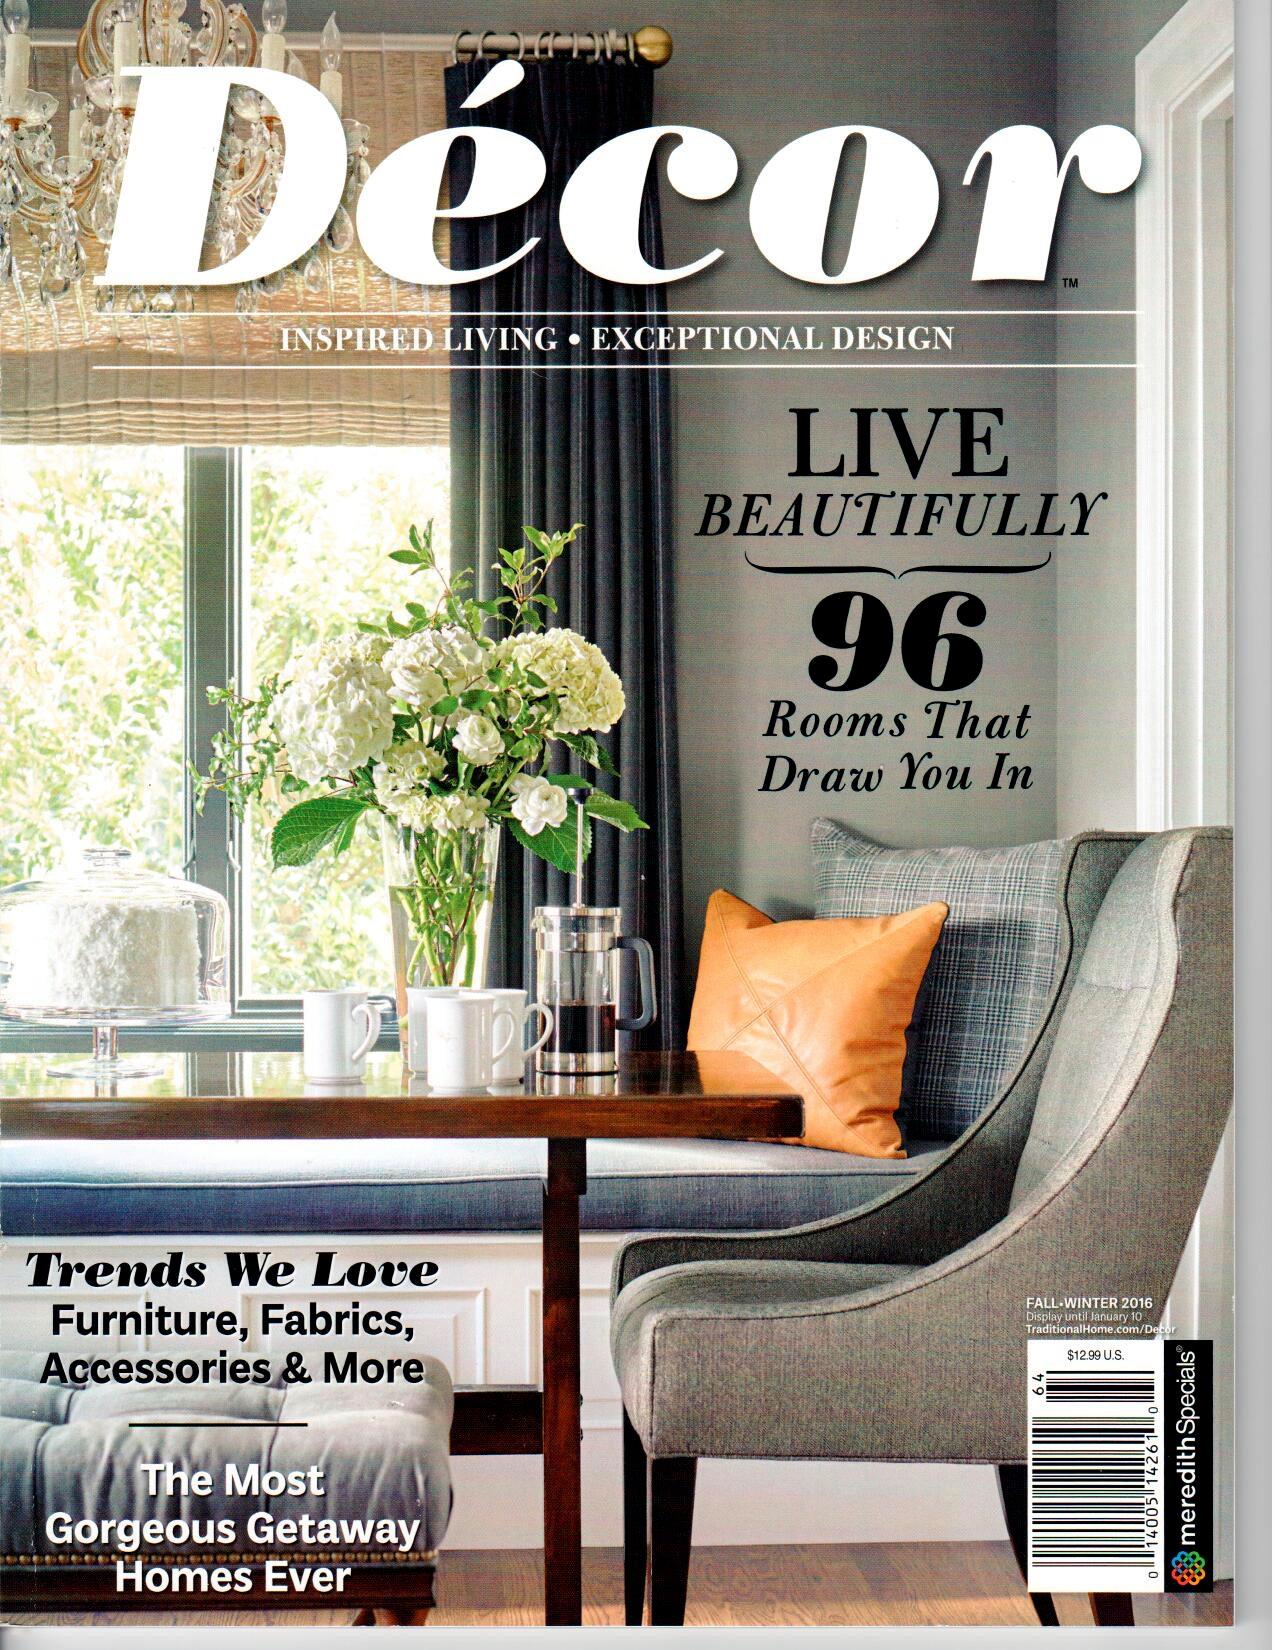 House Beautiful Magazine April 2017 Interior Designer Shazalynn Cavin-Winfrey of SCW Interiors in Alexandria, Virginia